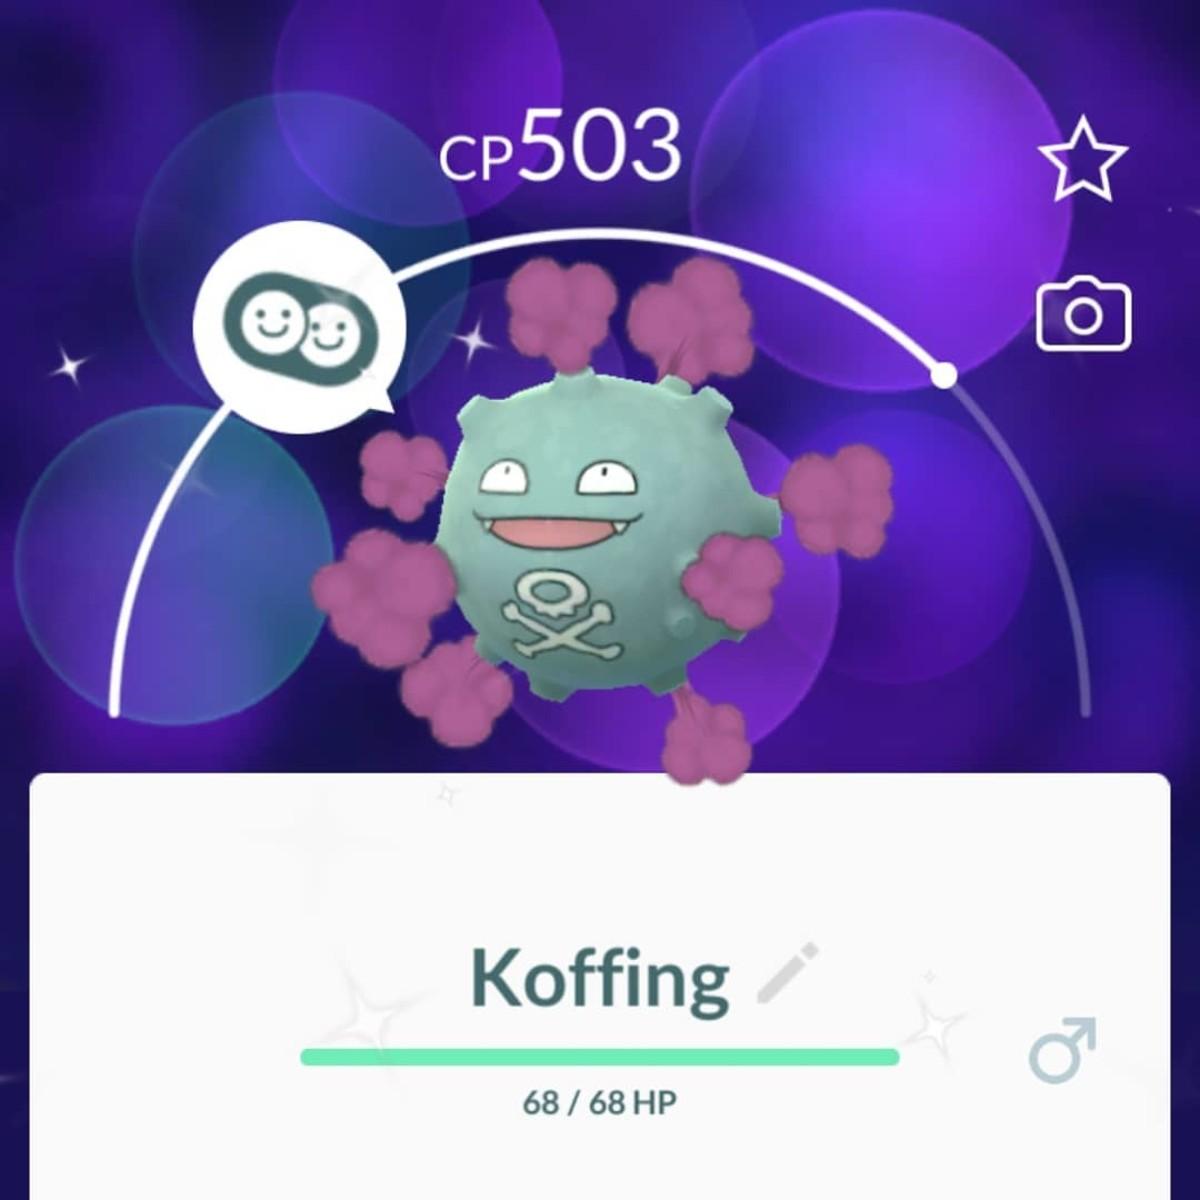 Shiny Koffing